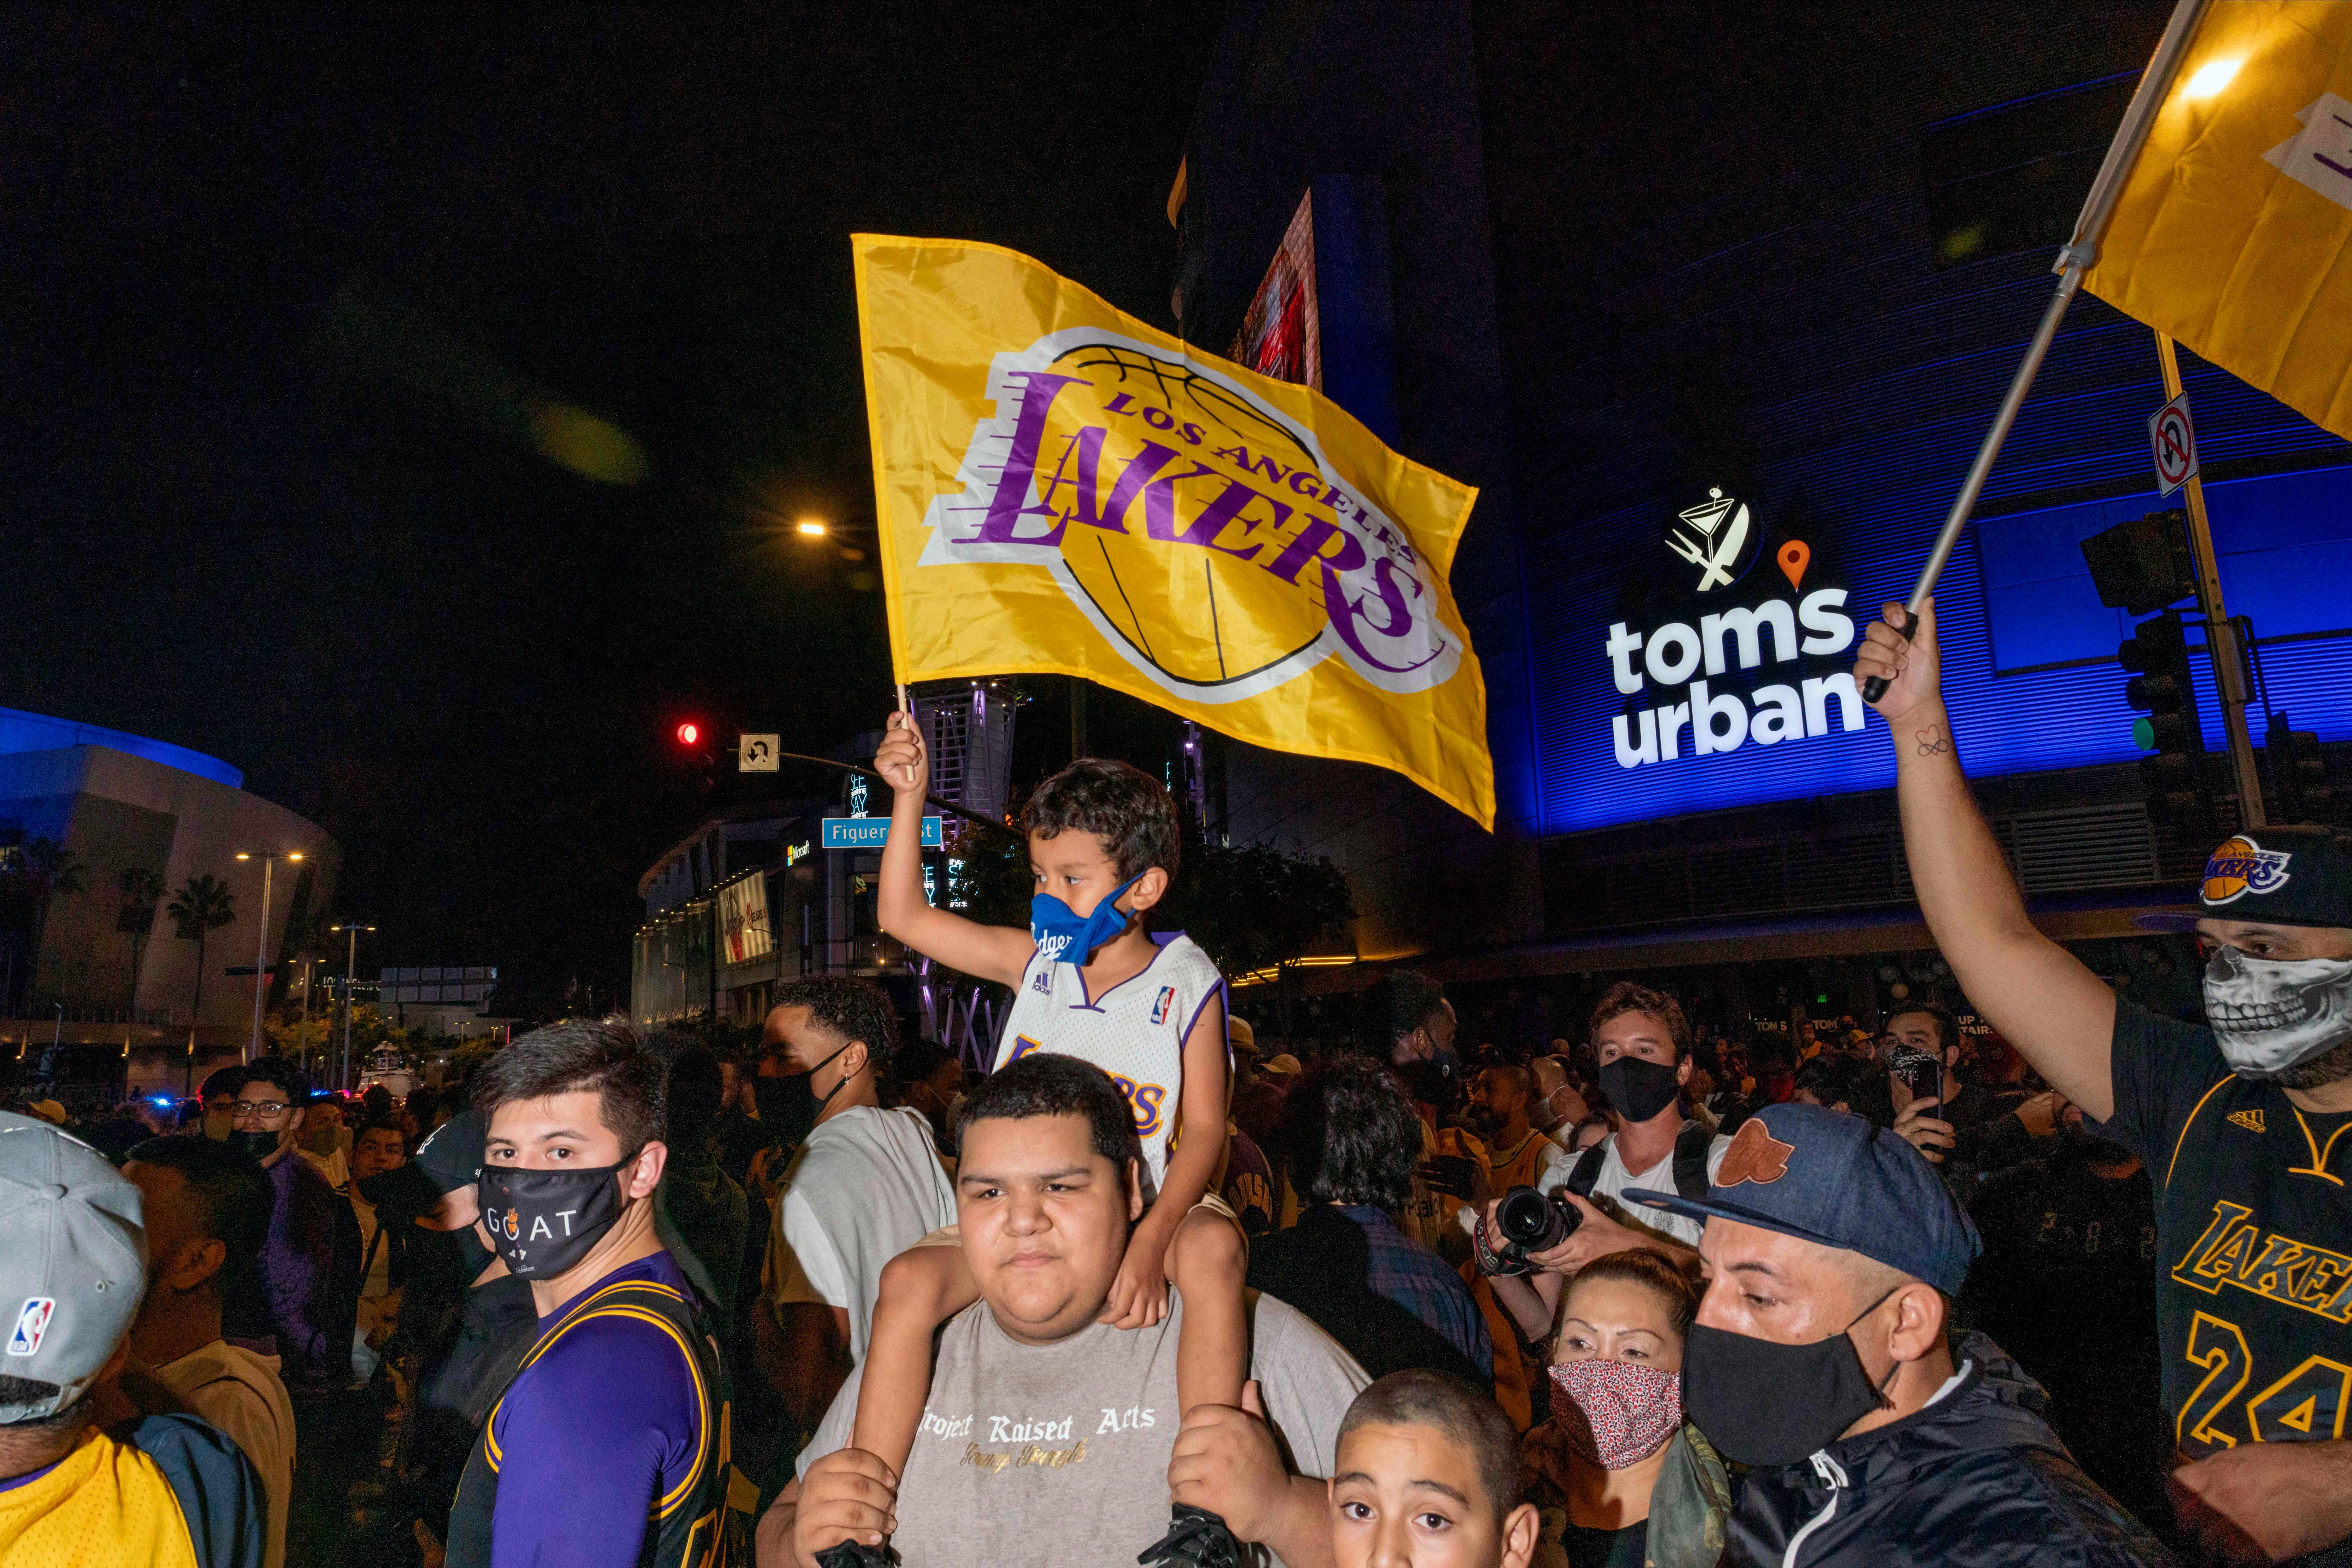 NBA fans celebrate the Lakers winning the 2020 NBA Championship